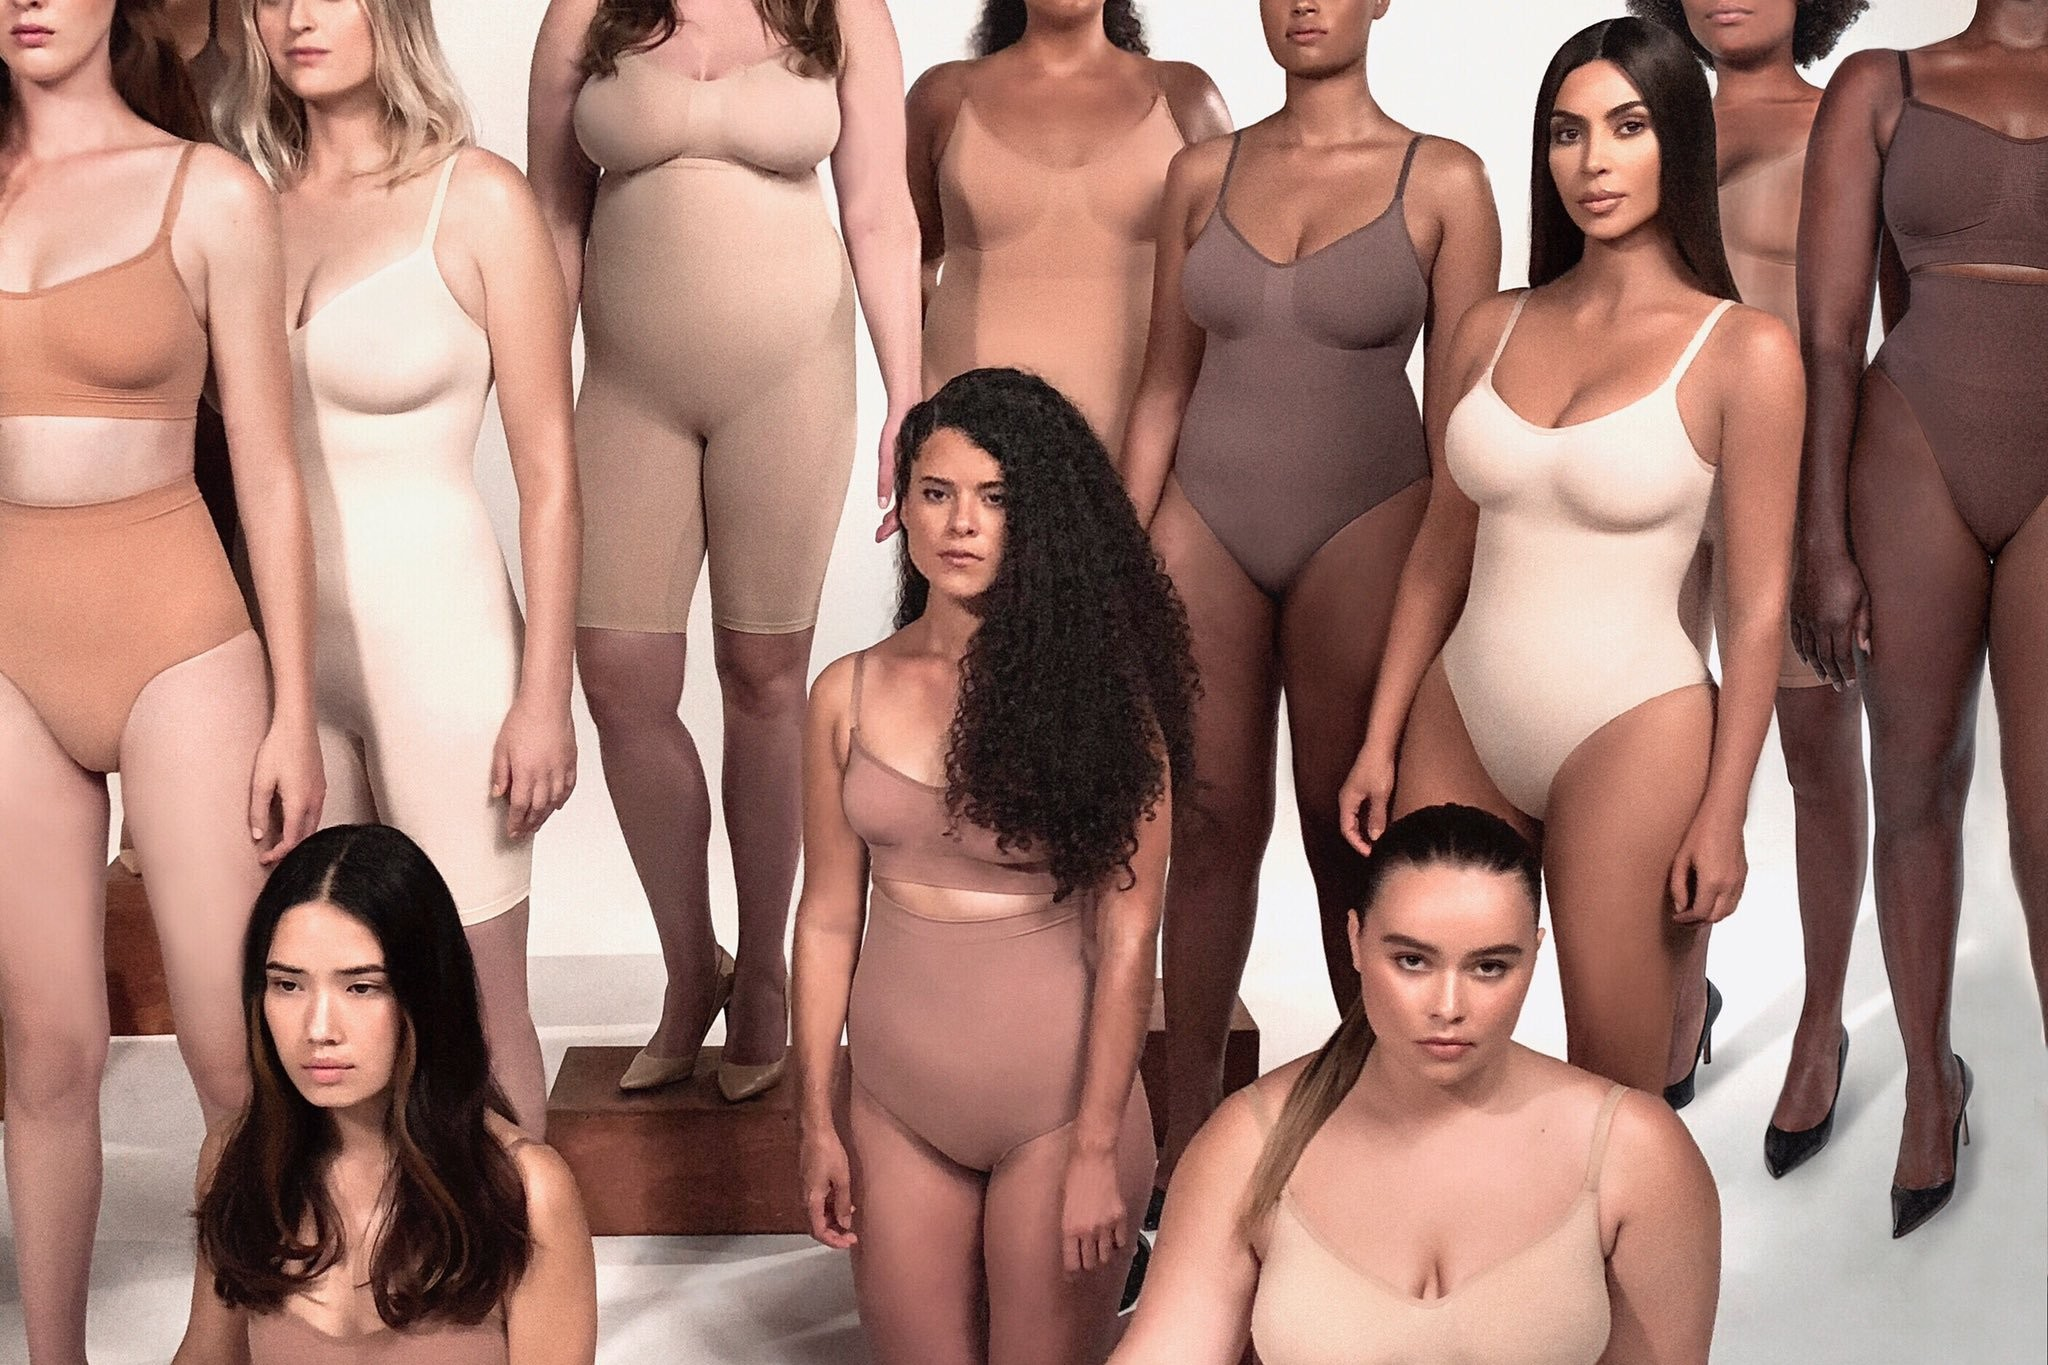 News about Kim Kardashian West, Olive Garden, KFC, Johnson & Johnson: Wake-Up Call